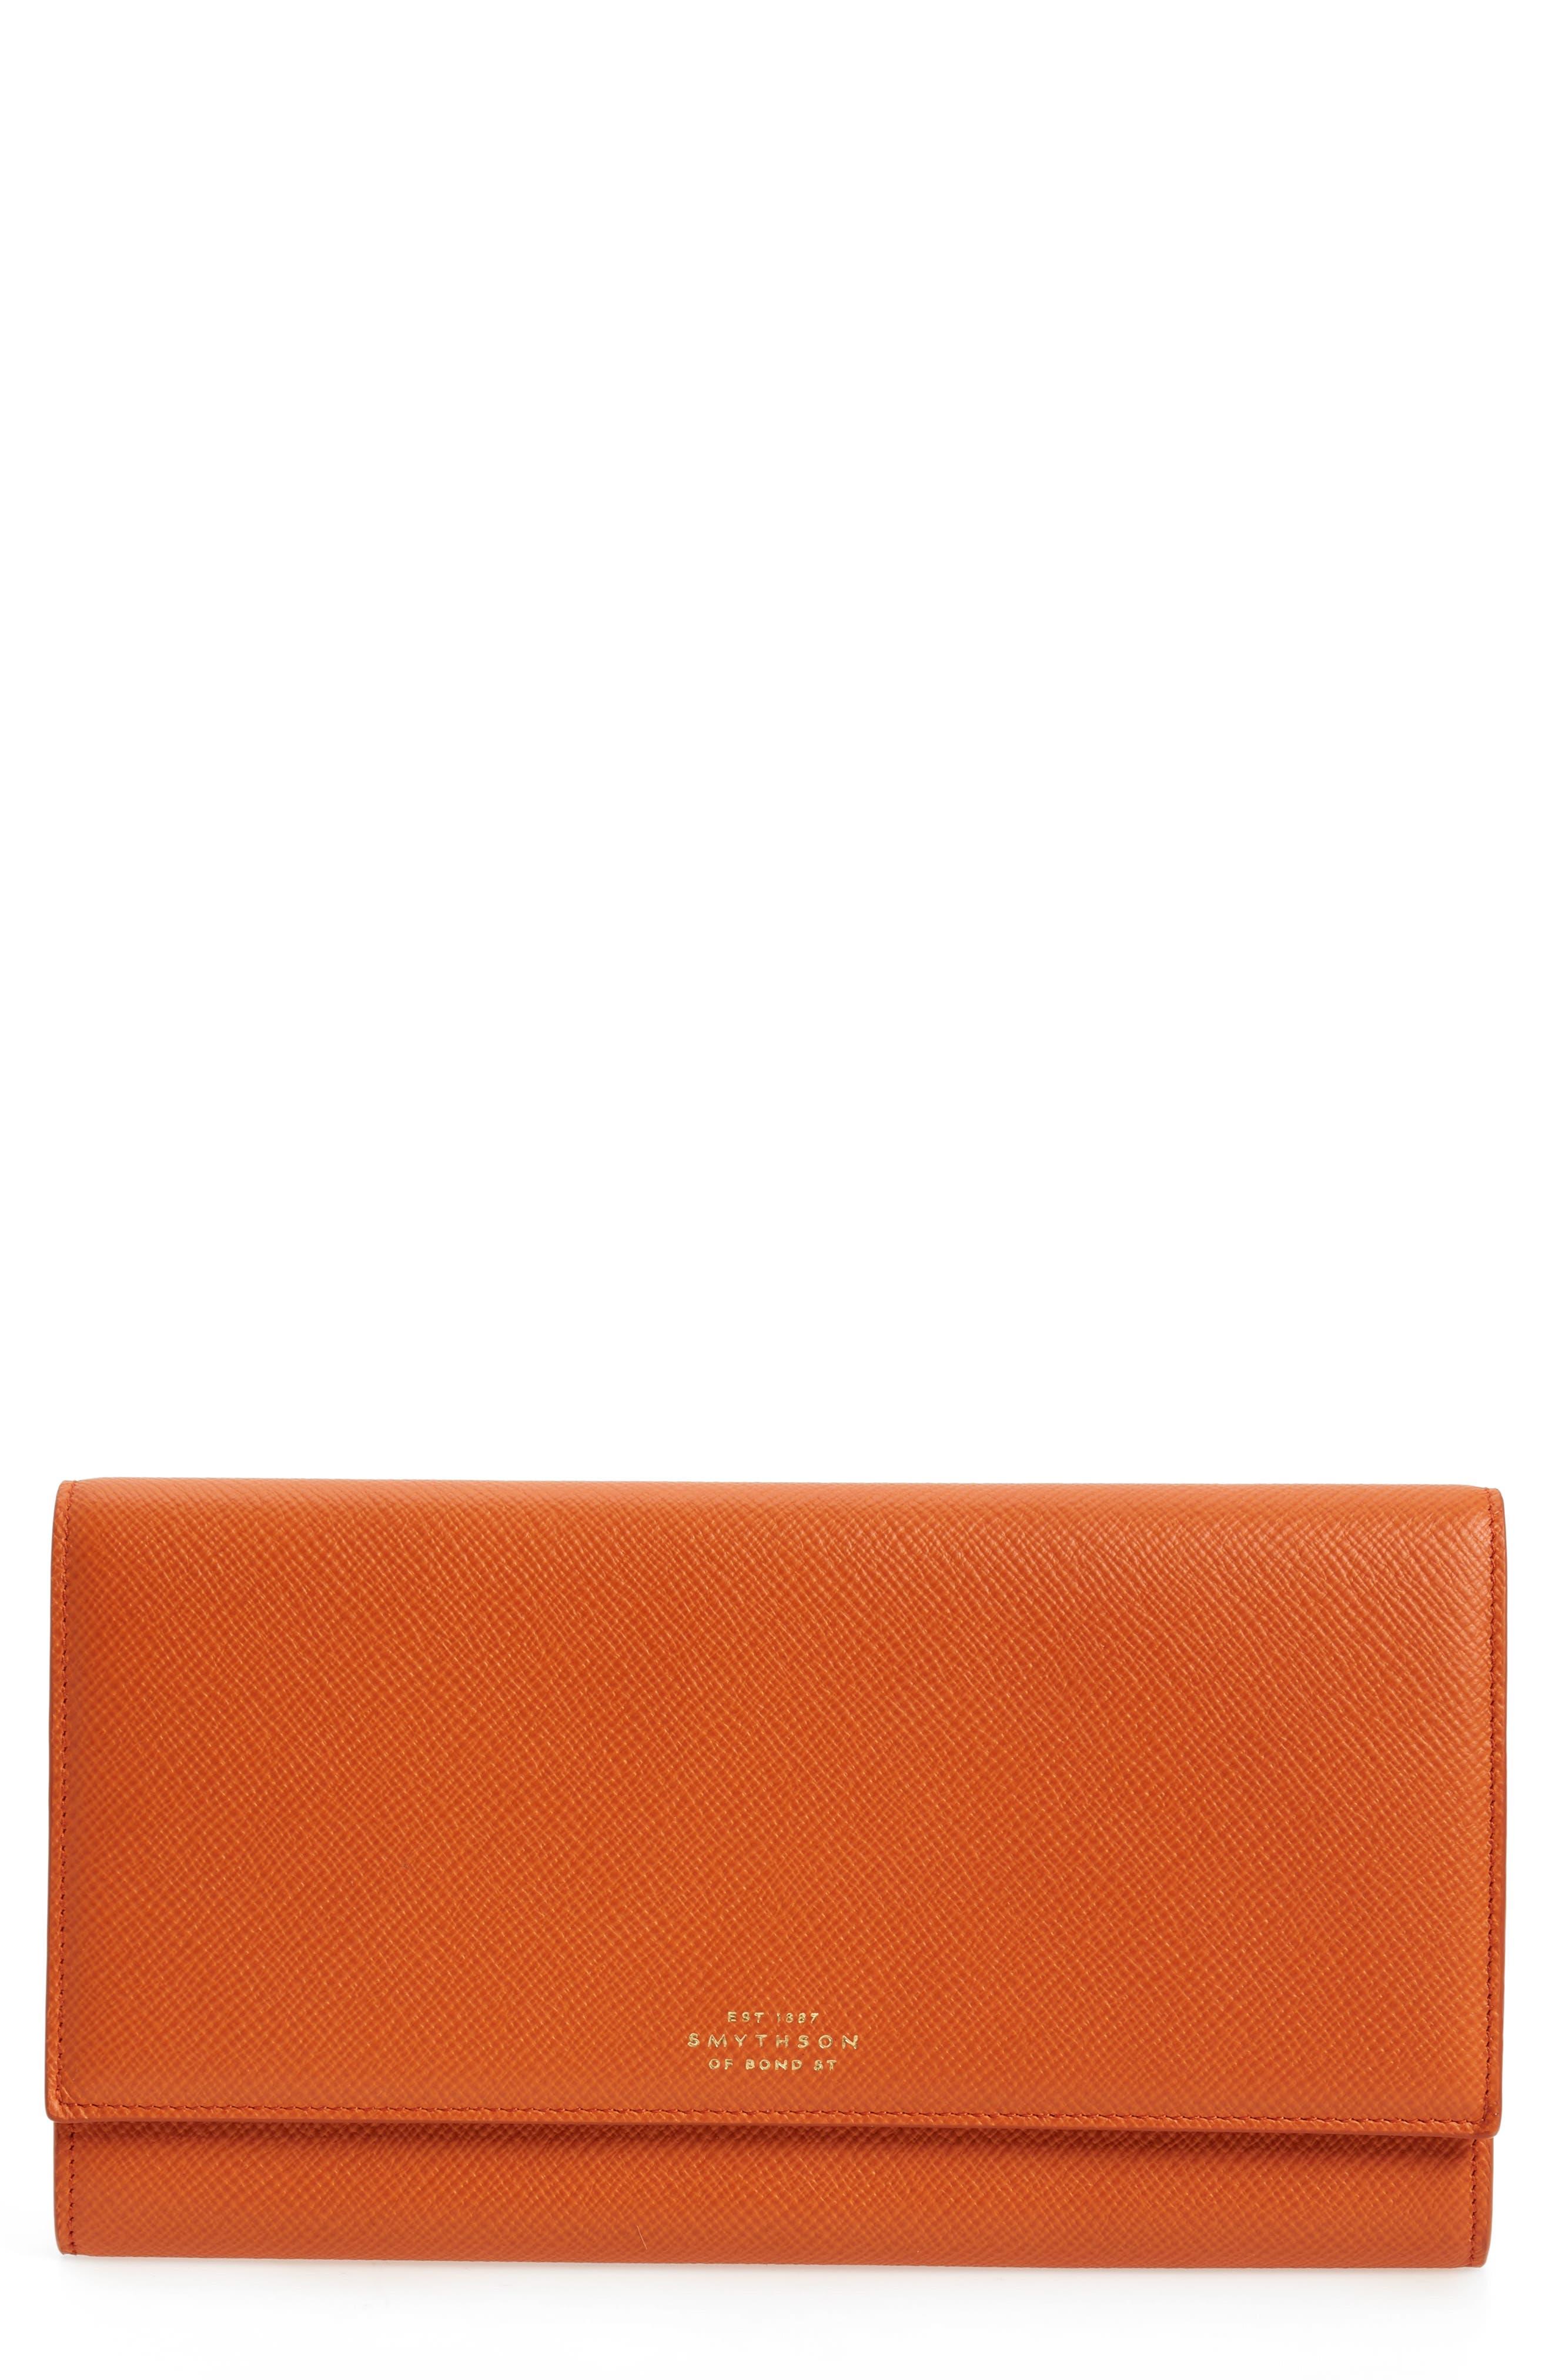 Smythson Panama Marshall Calfskin Leather Travel Wallet